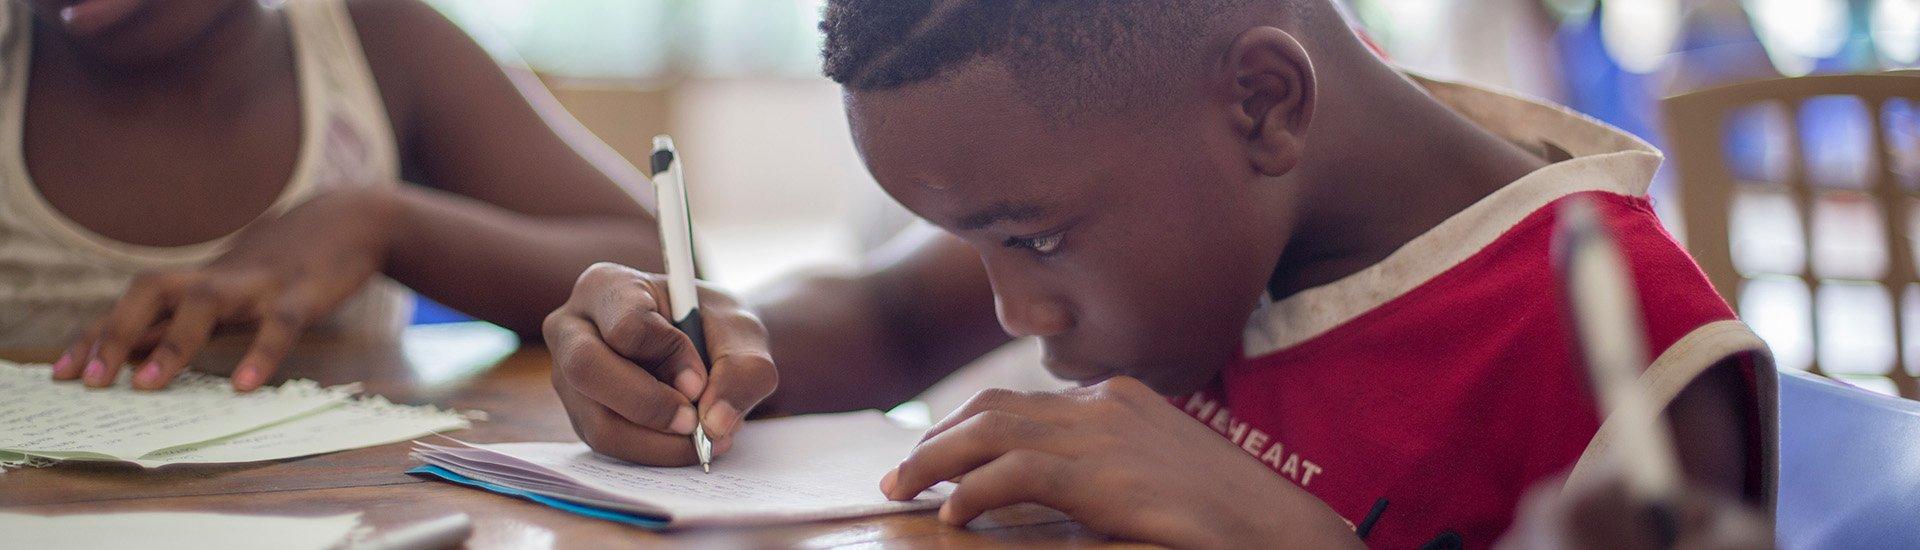 child-learning-writing-activity